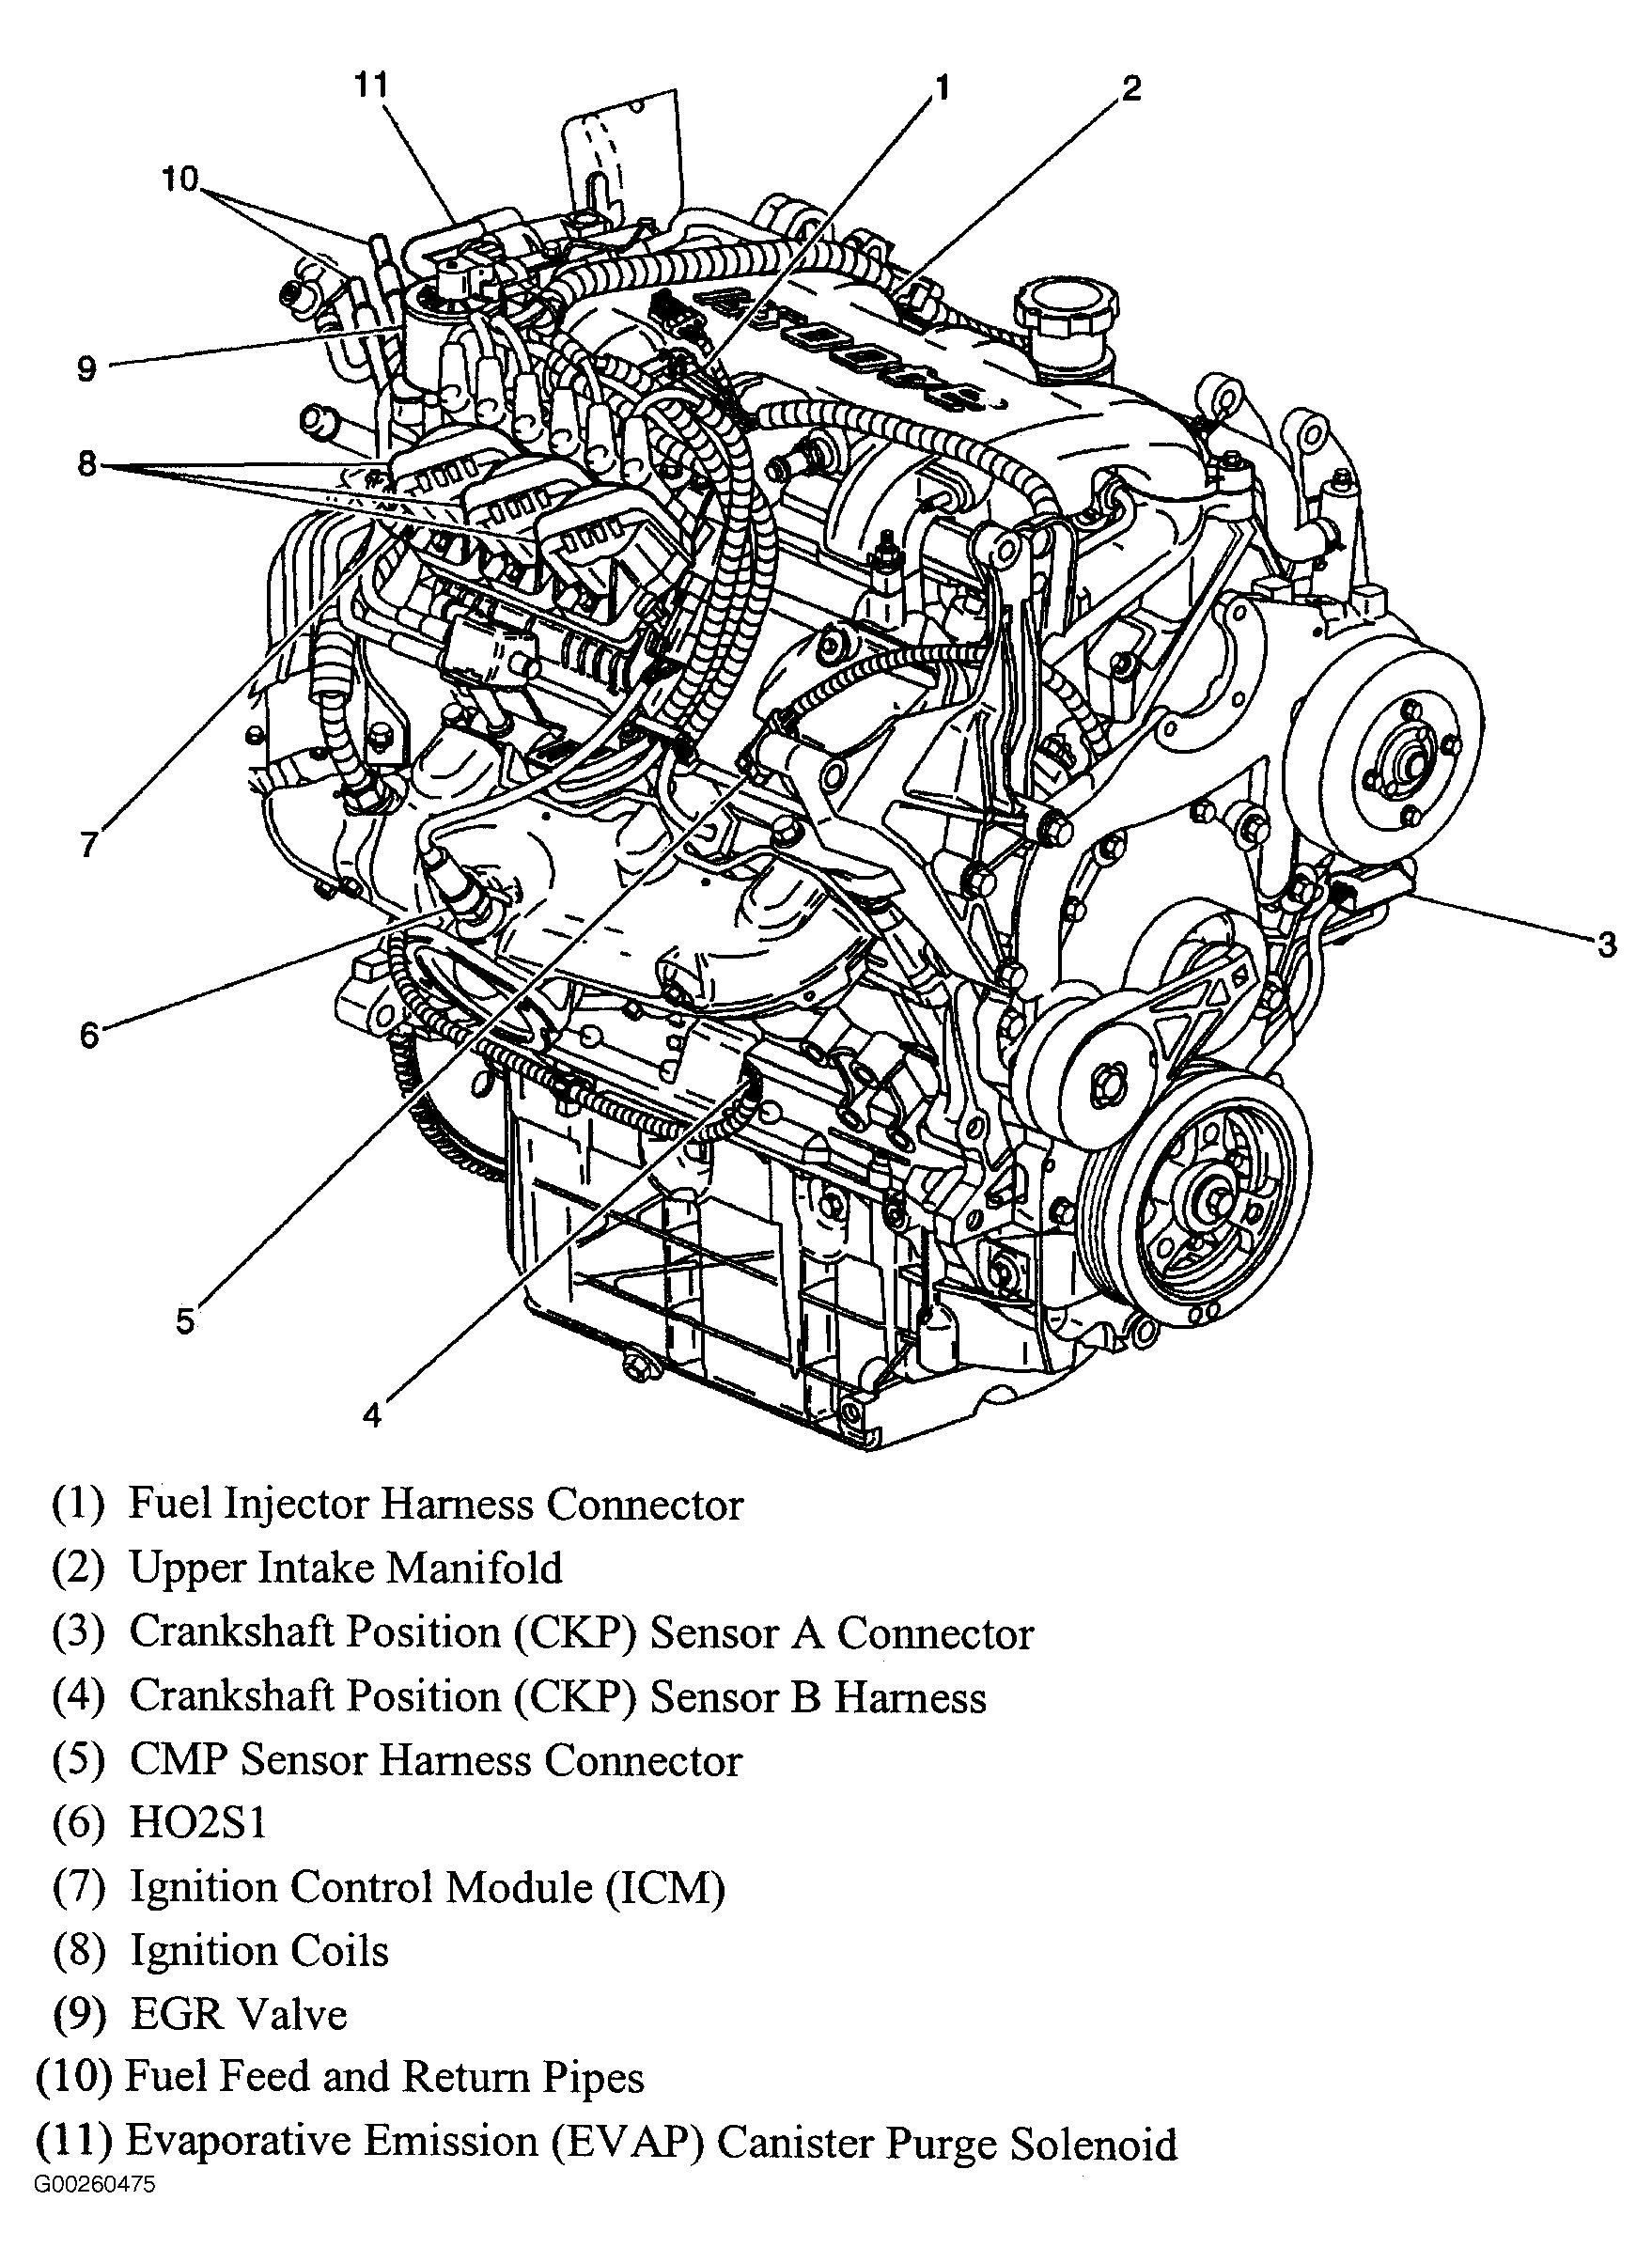 hight resolution of chevy 3400 engine diagram wiring diagram todays rh 16 6 10 1813weddingbarn com chevy venture transmission diagram 2001 chevy venture engine diagram